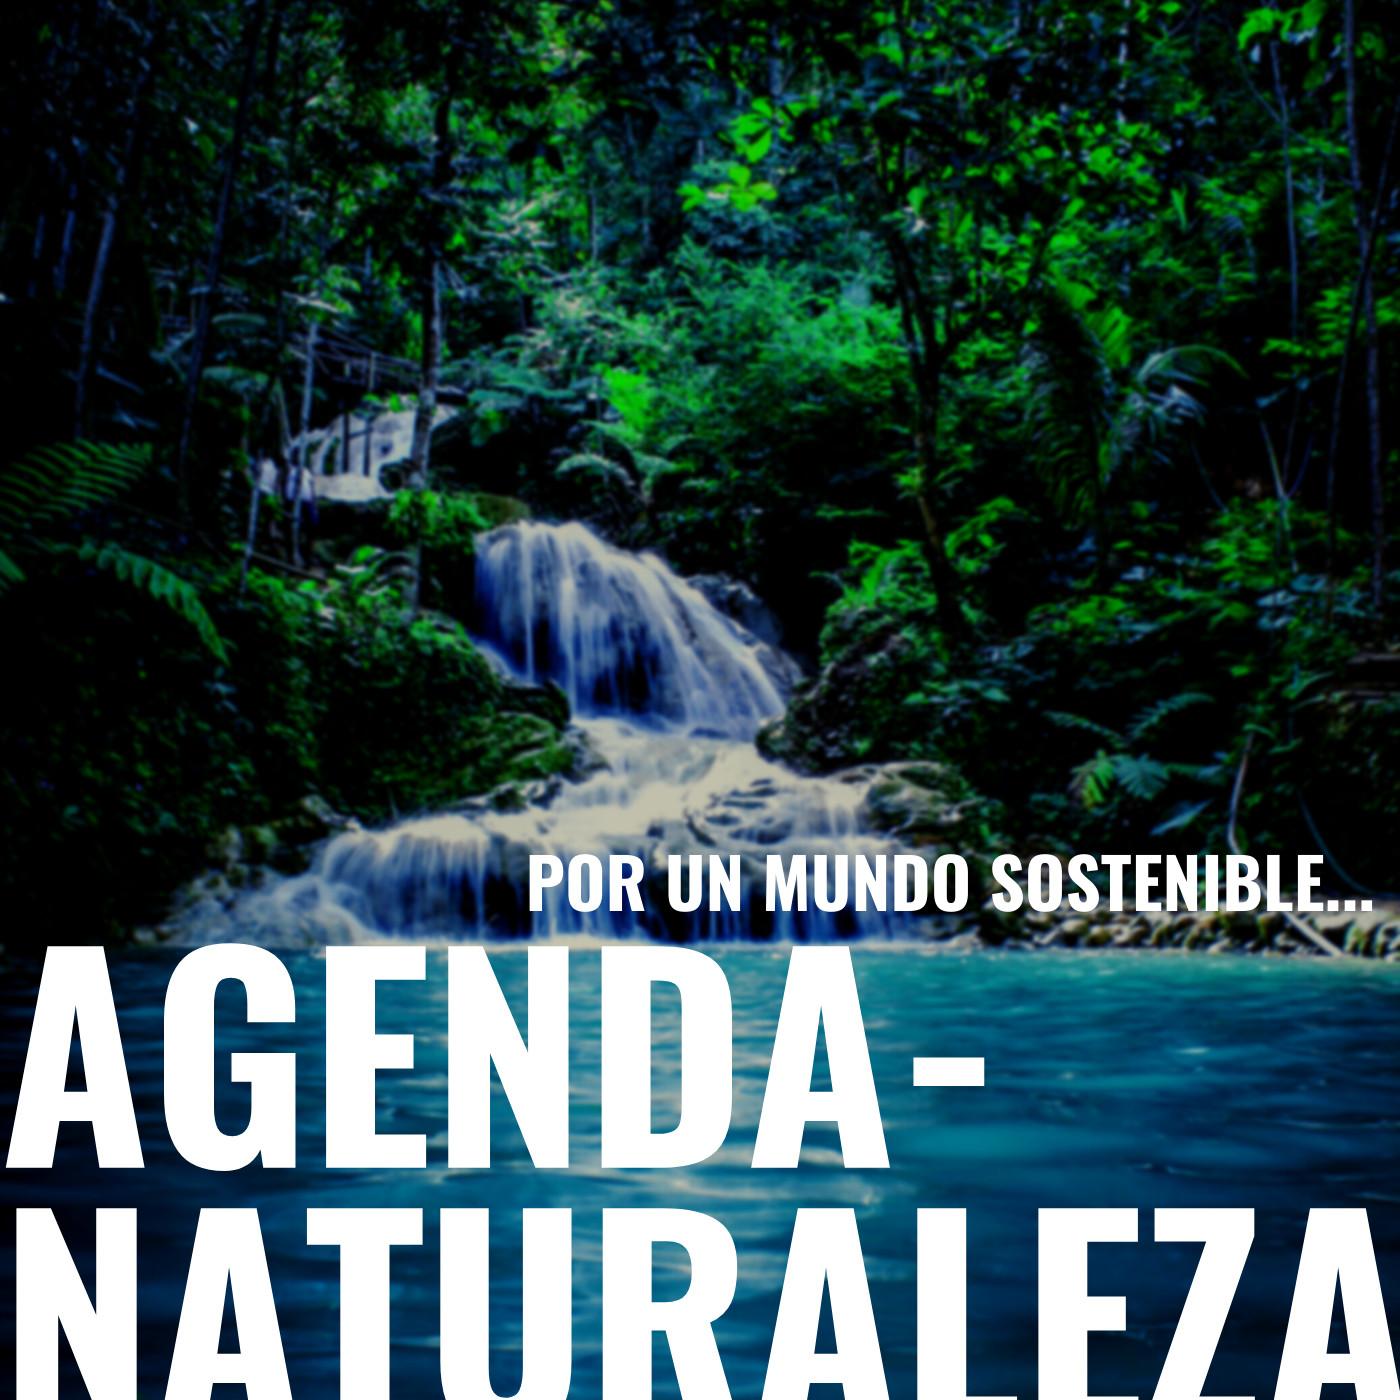 Agenda naturaleza 111. mosquitos mutantes.